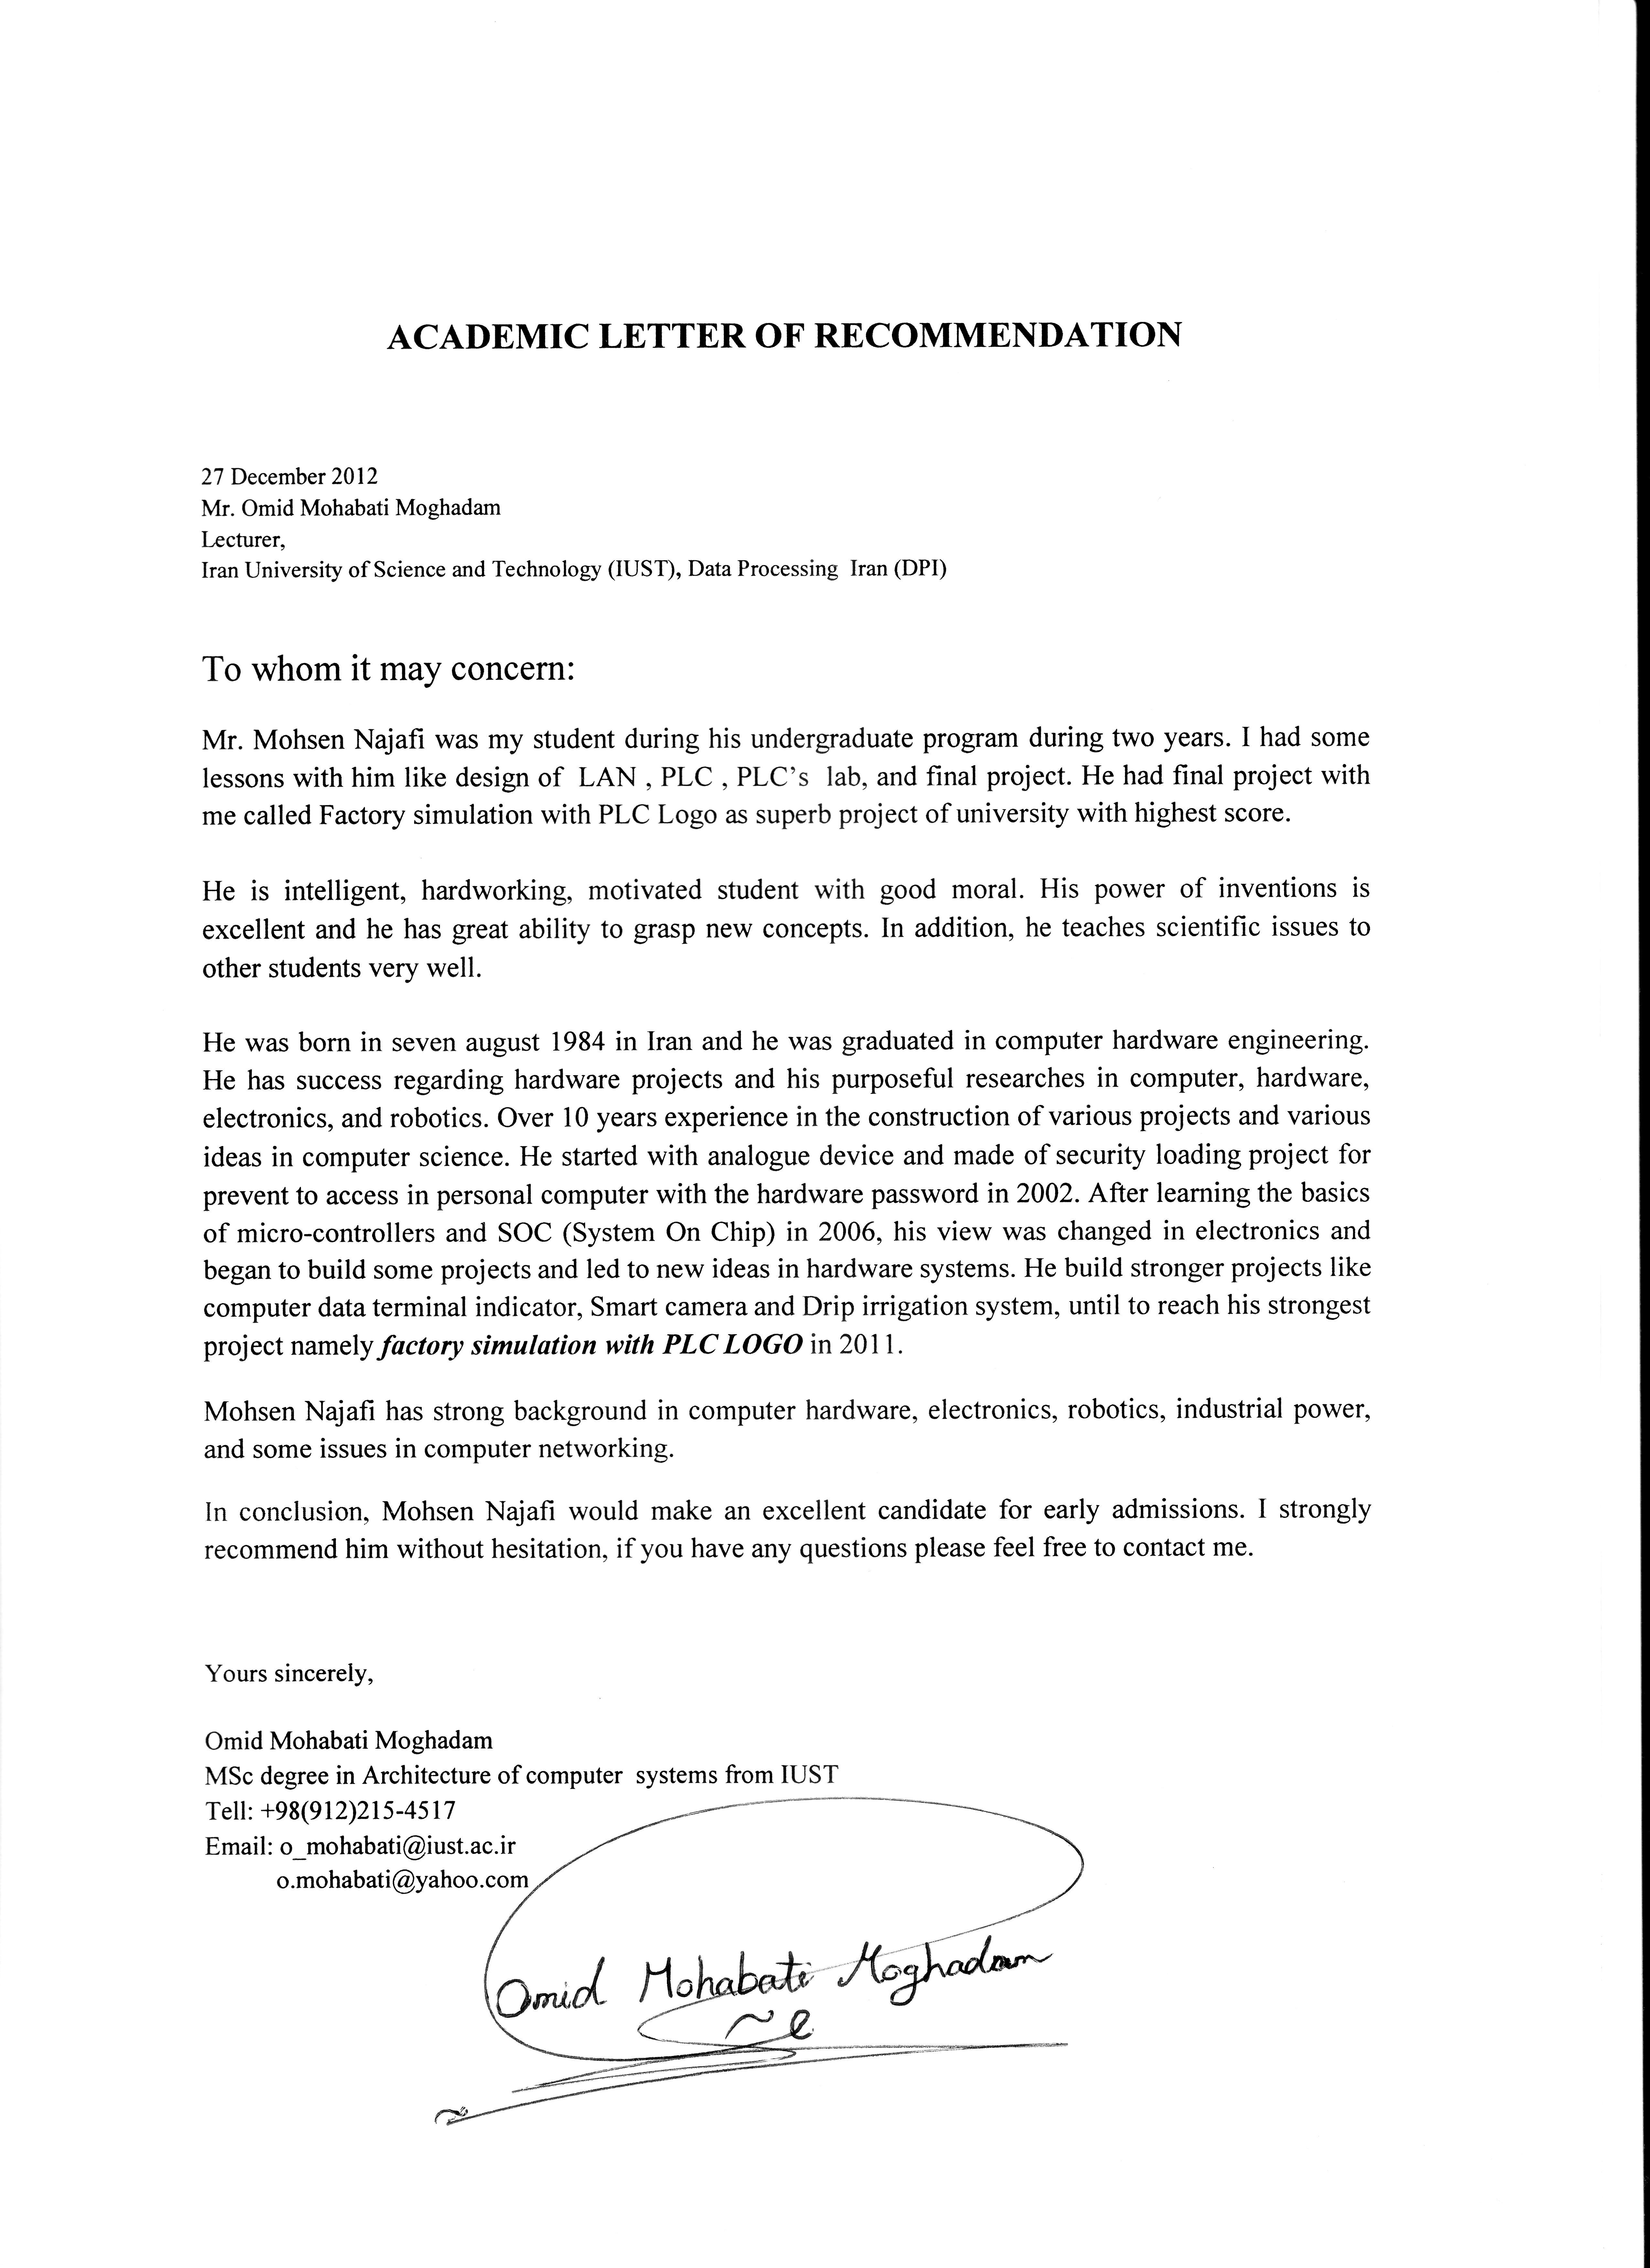 computer science recommendation letter - Monza berglauf-verband com